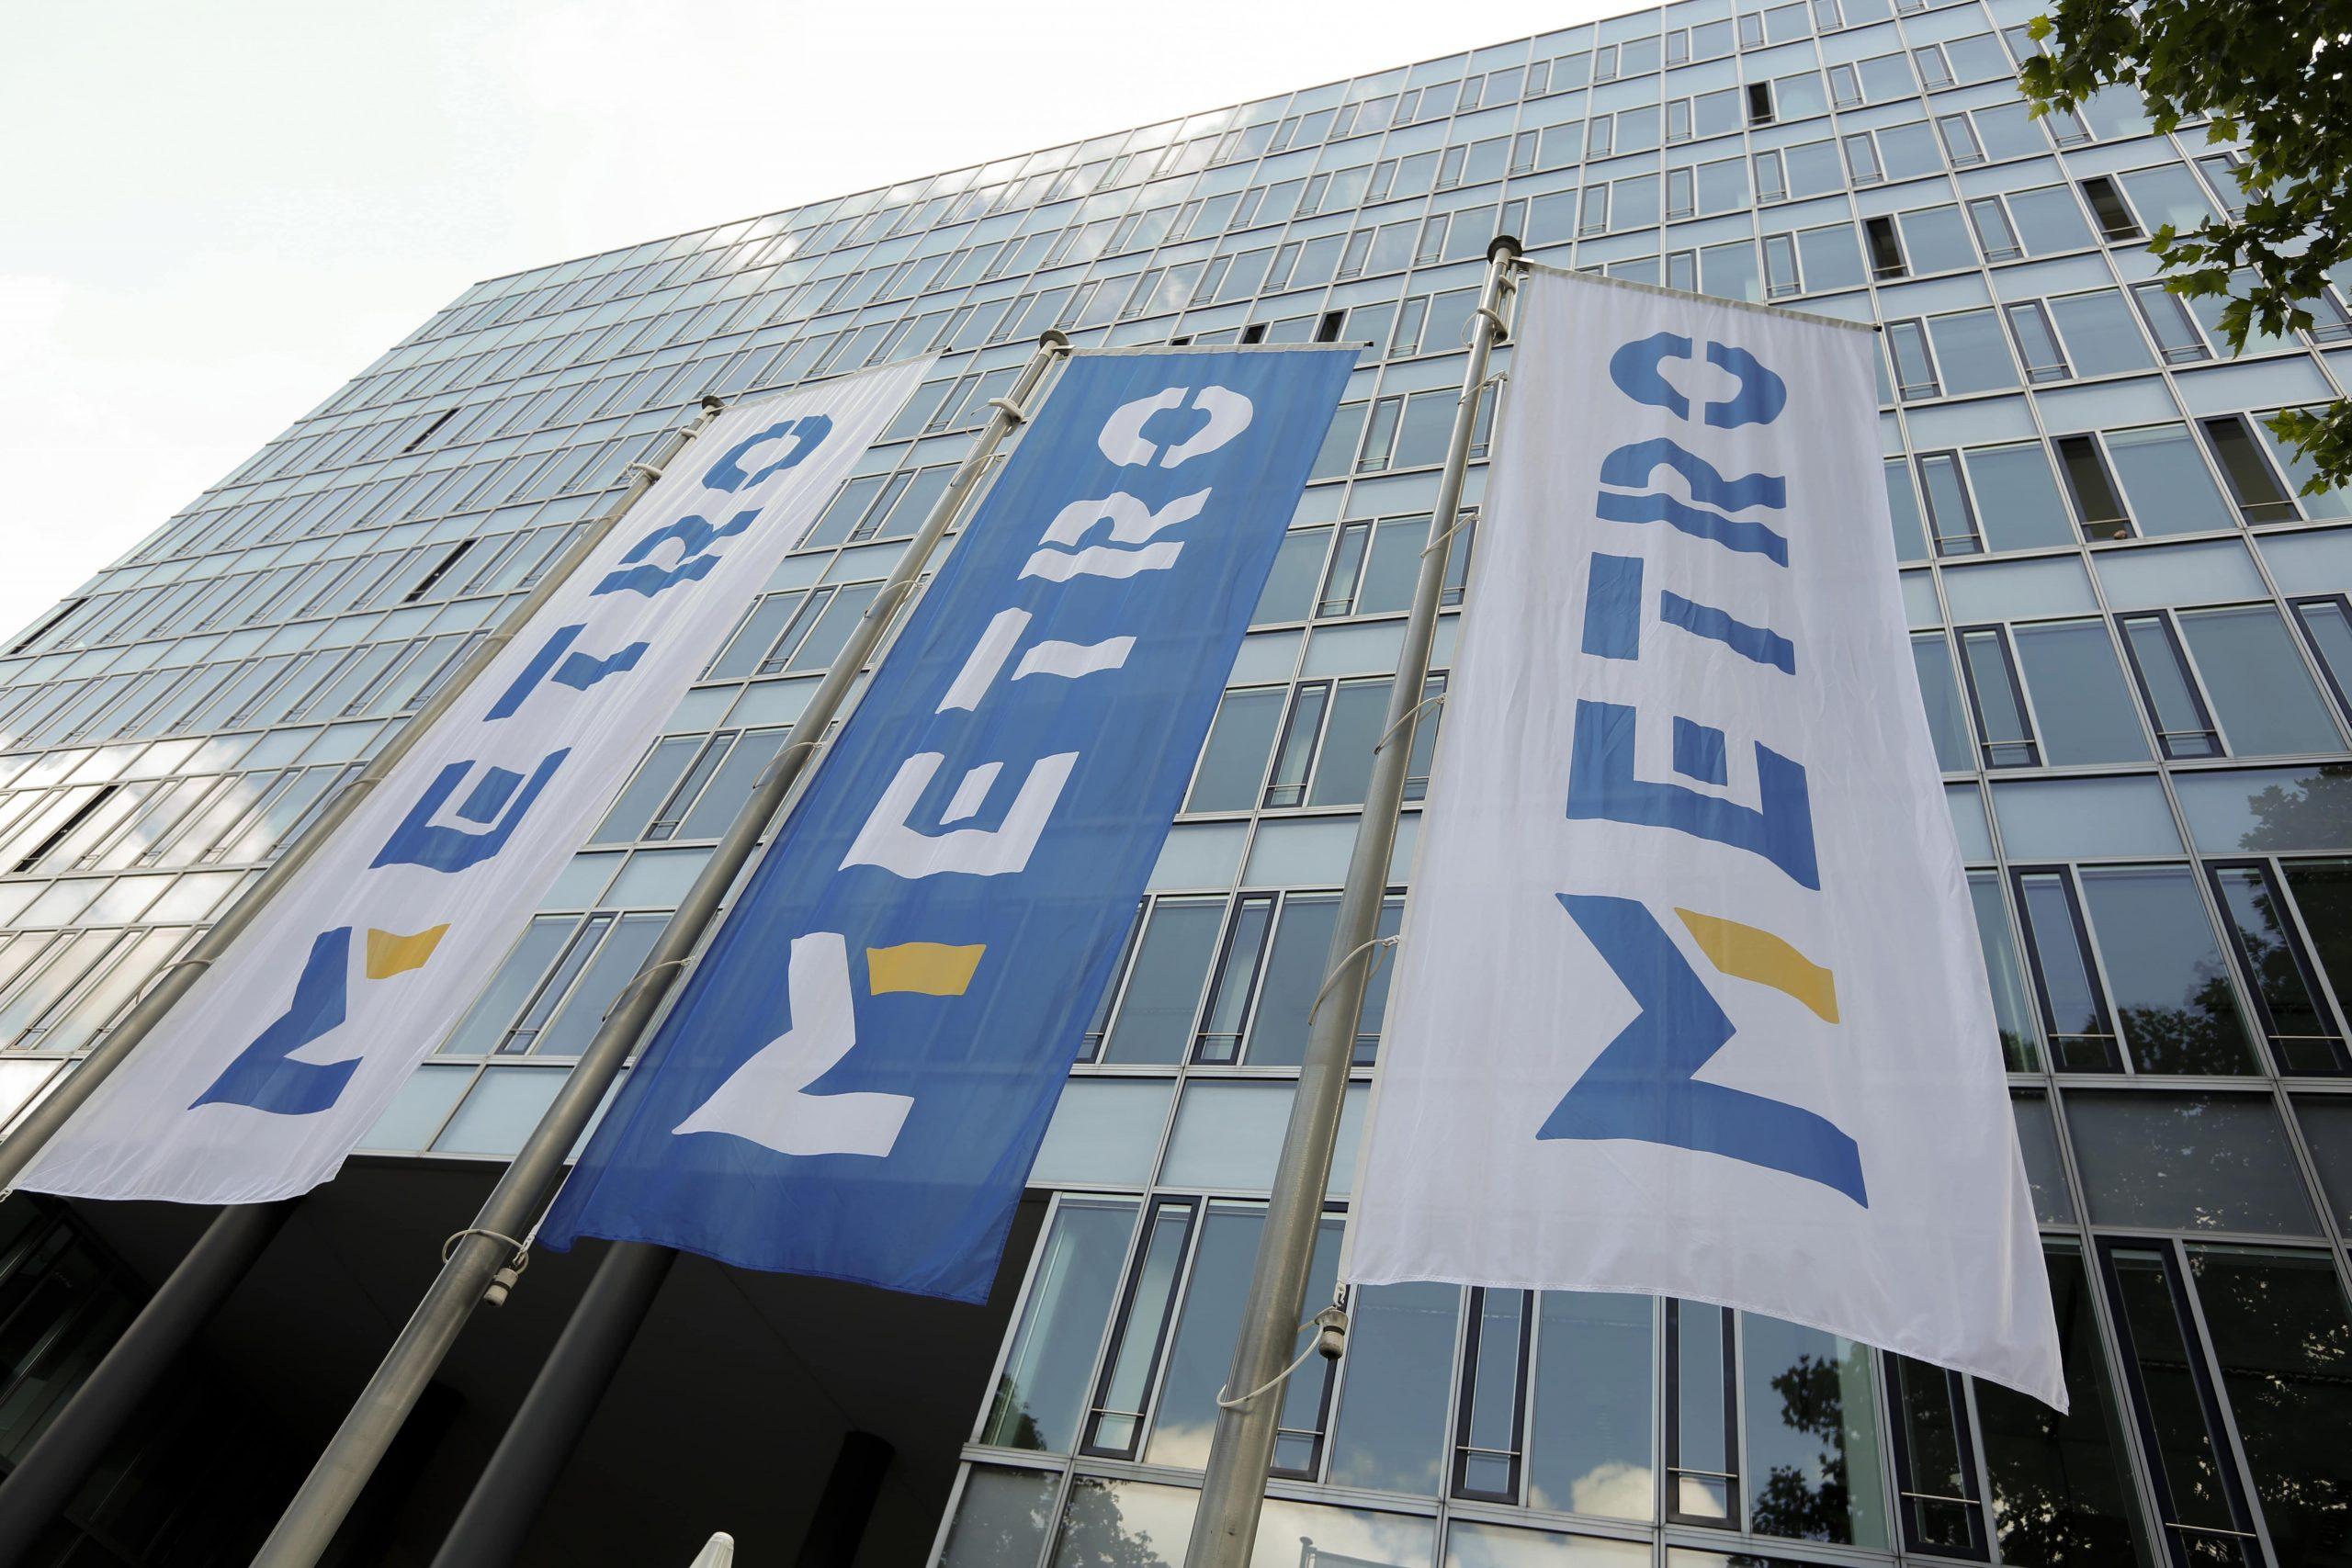 Metro remains defiant despite sales slump